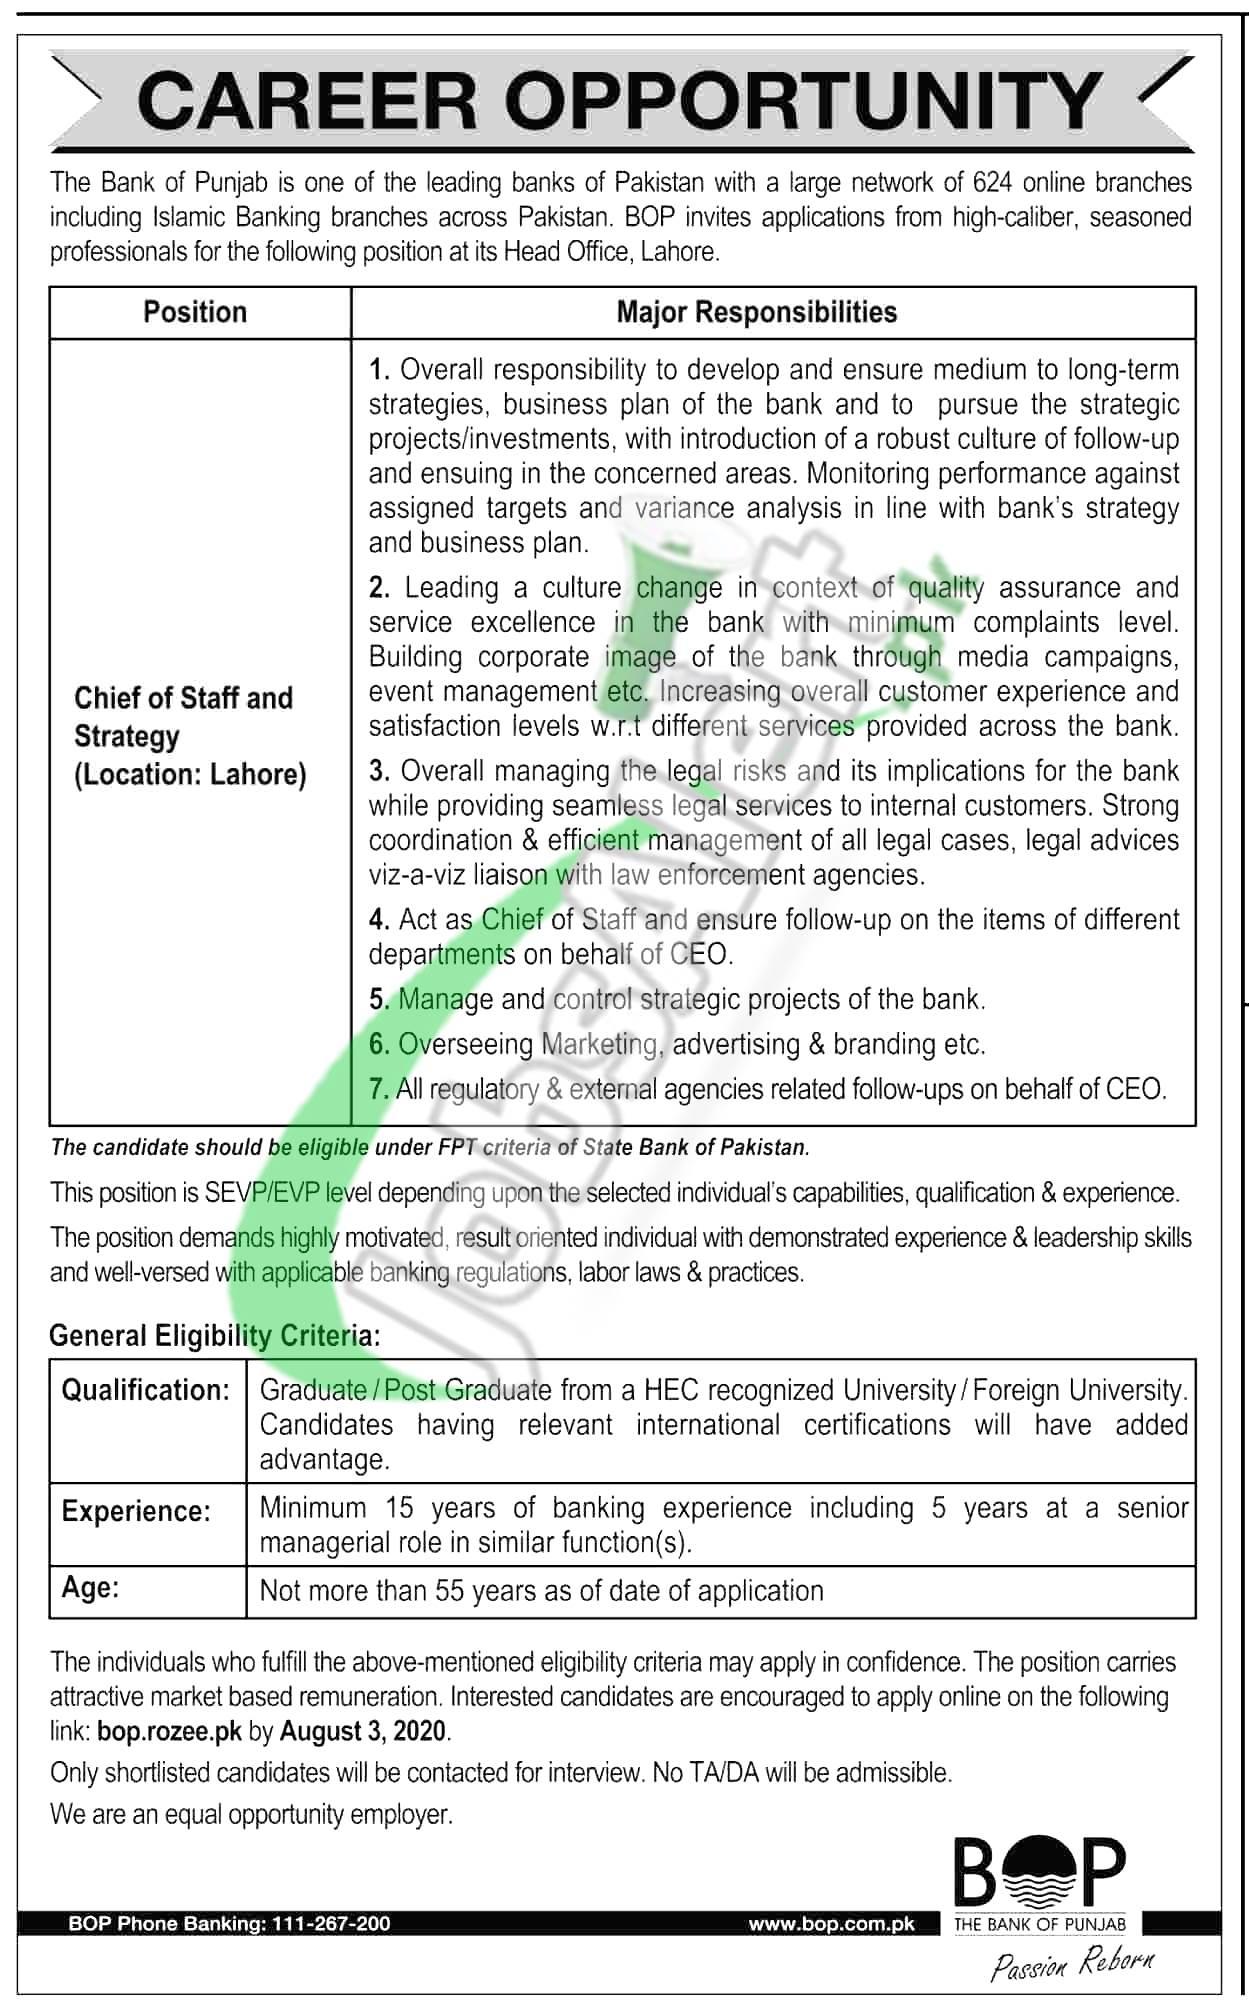 www.bop.com.pk Jobs